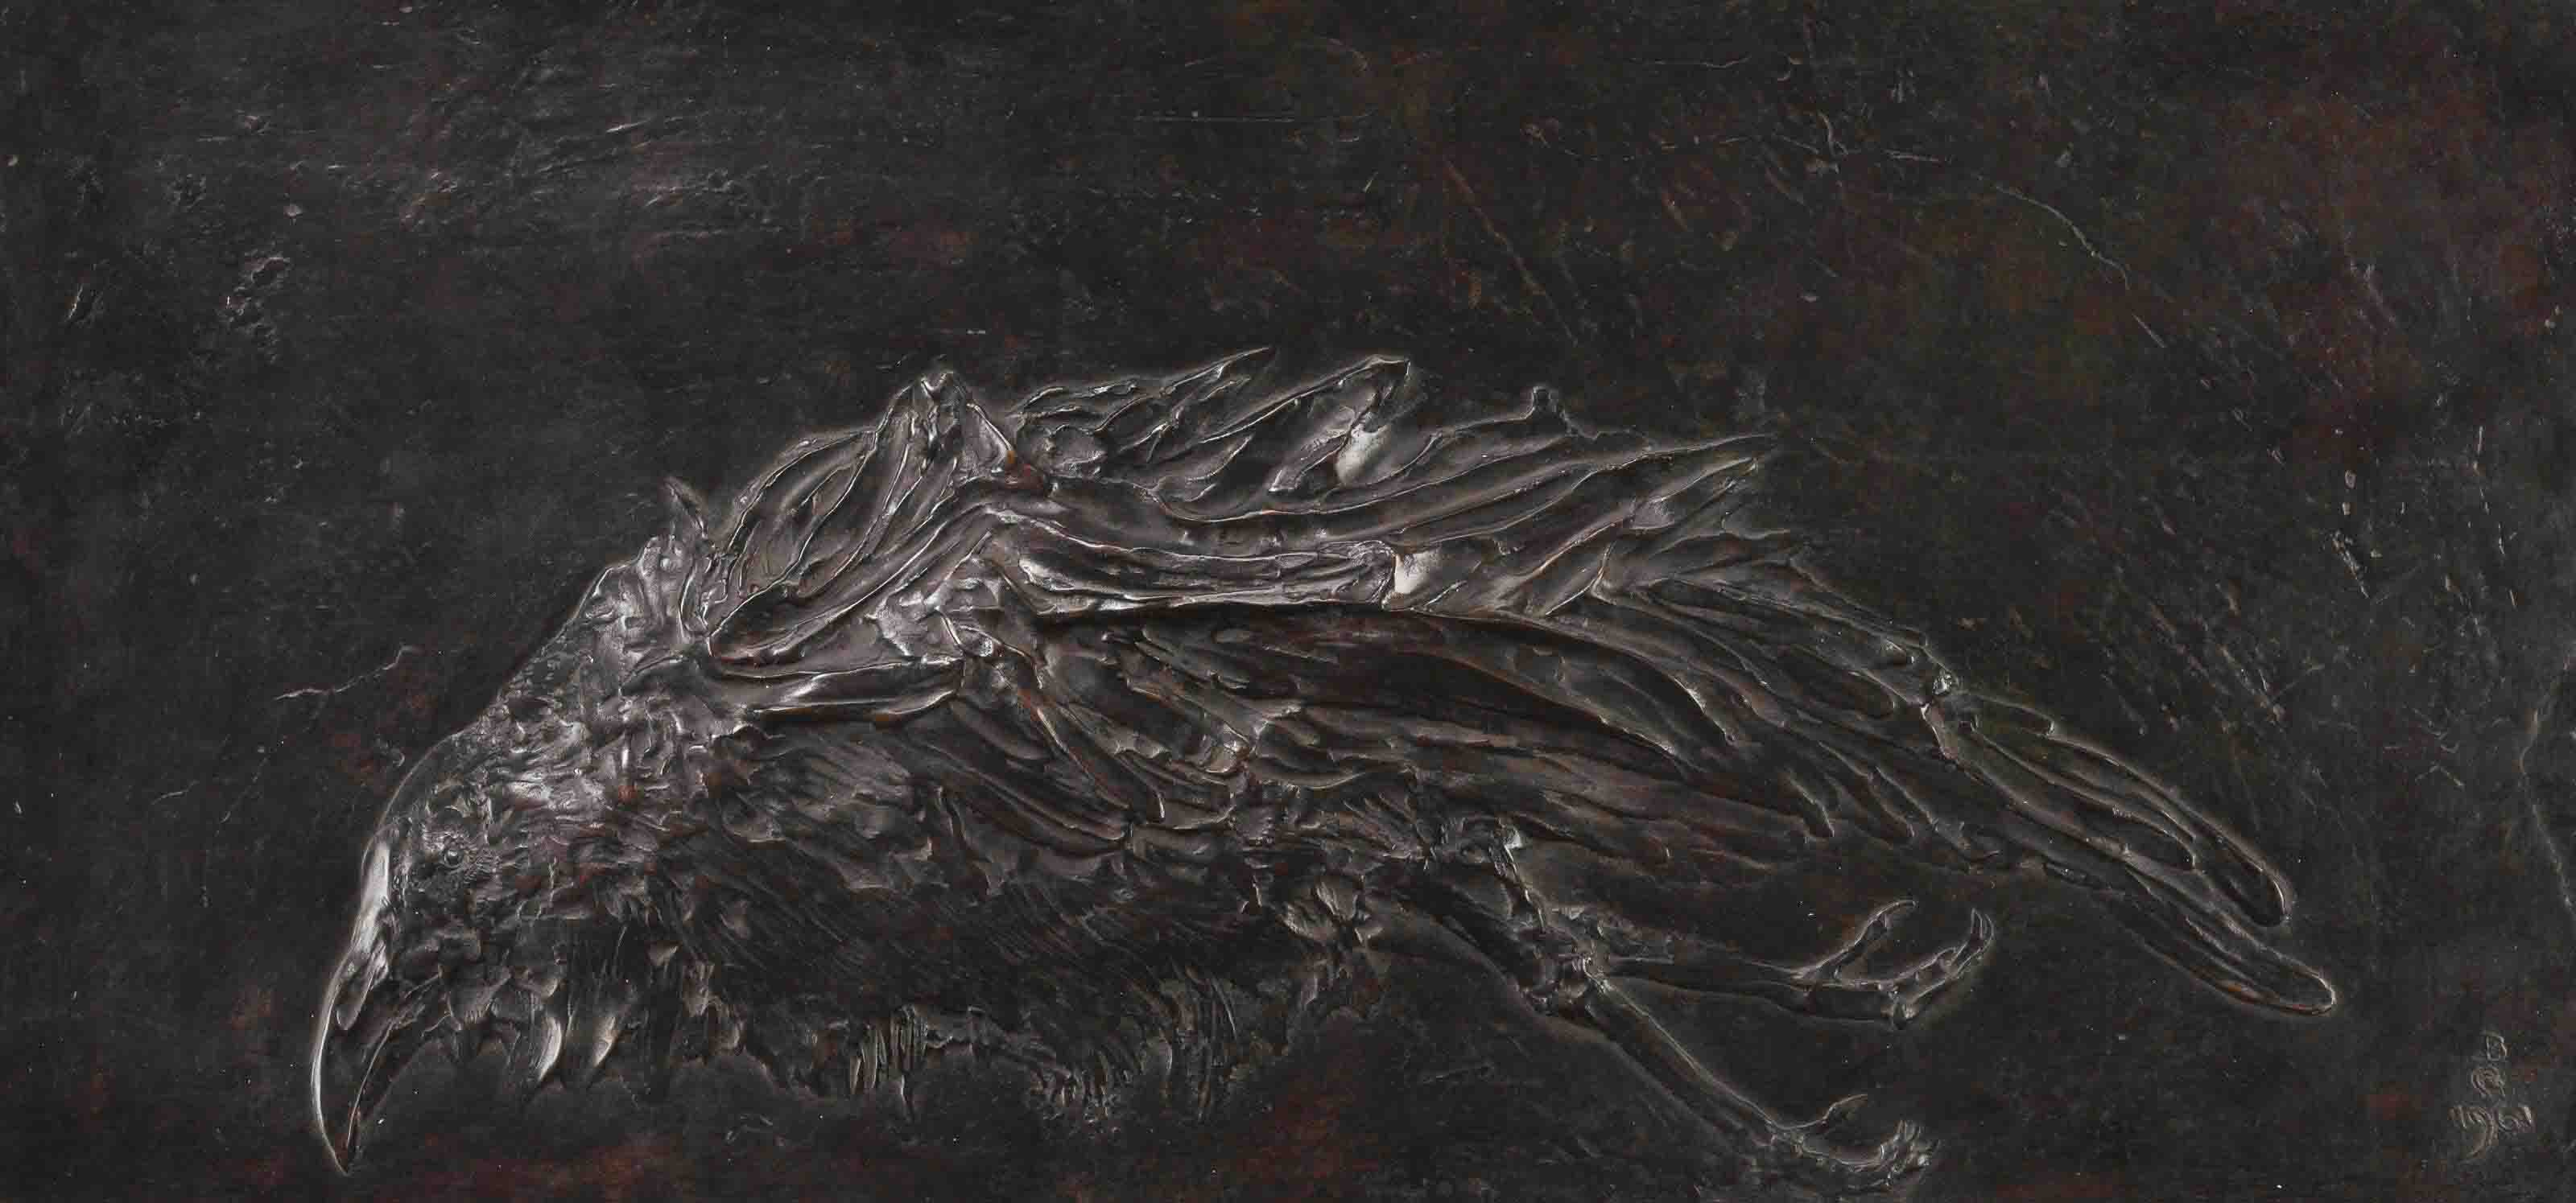 'Dead Crow'